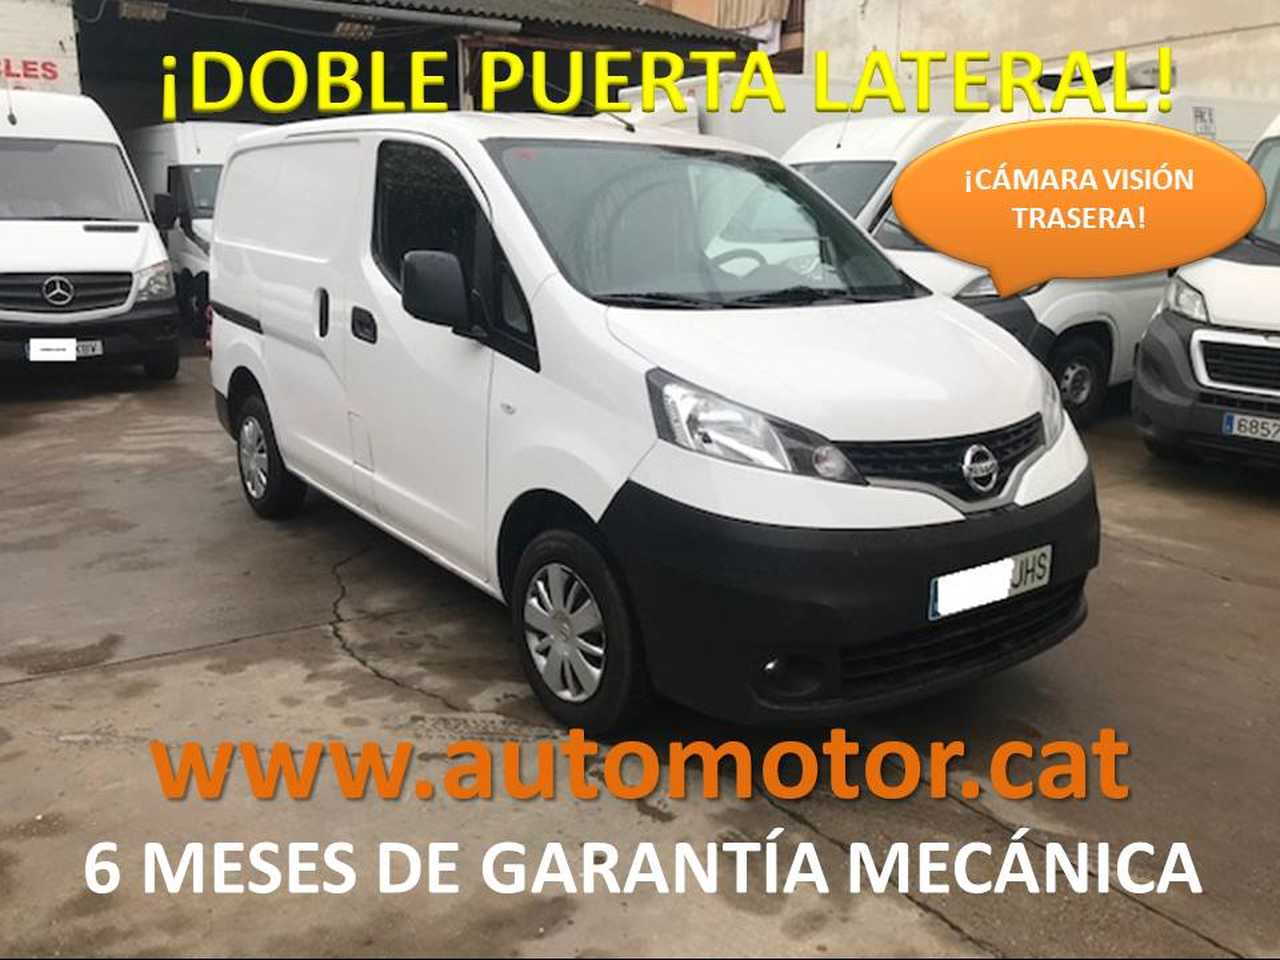 Nissan NV200 Furgón 1.5dCi Comfort 90 - GARANTIA MECANICA  - Foto 1